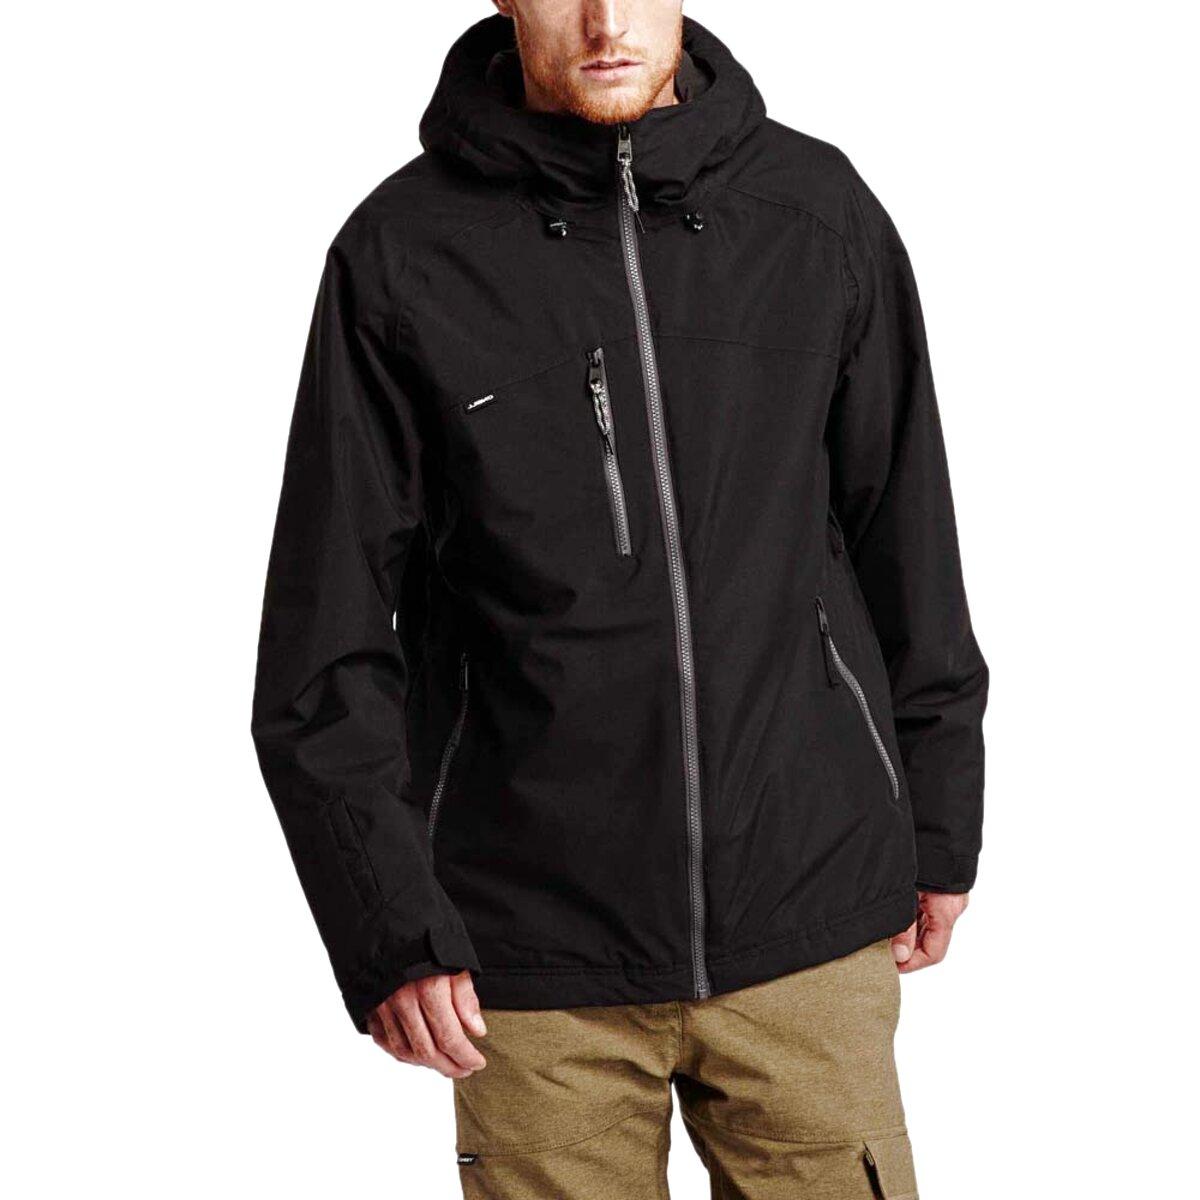 o neill jacket for sale